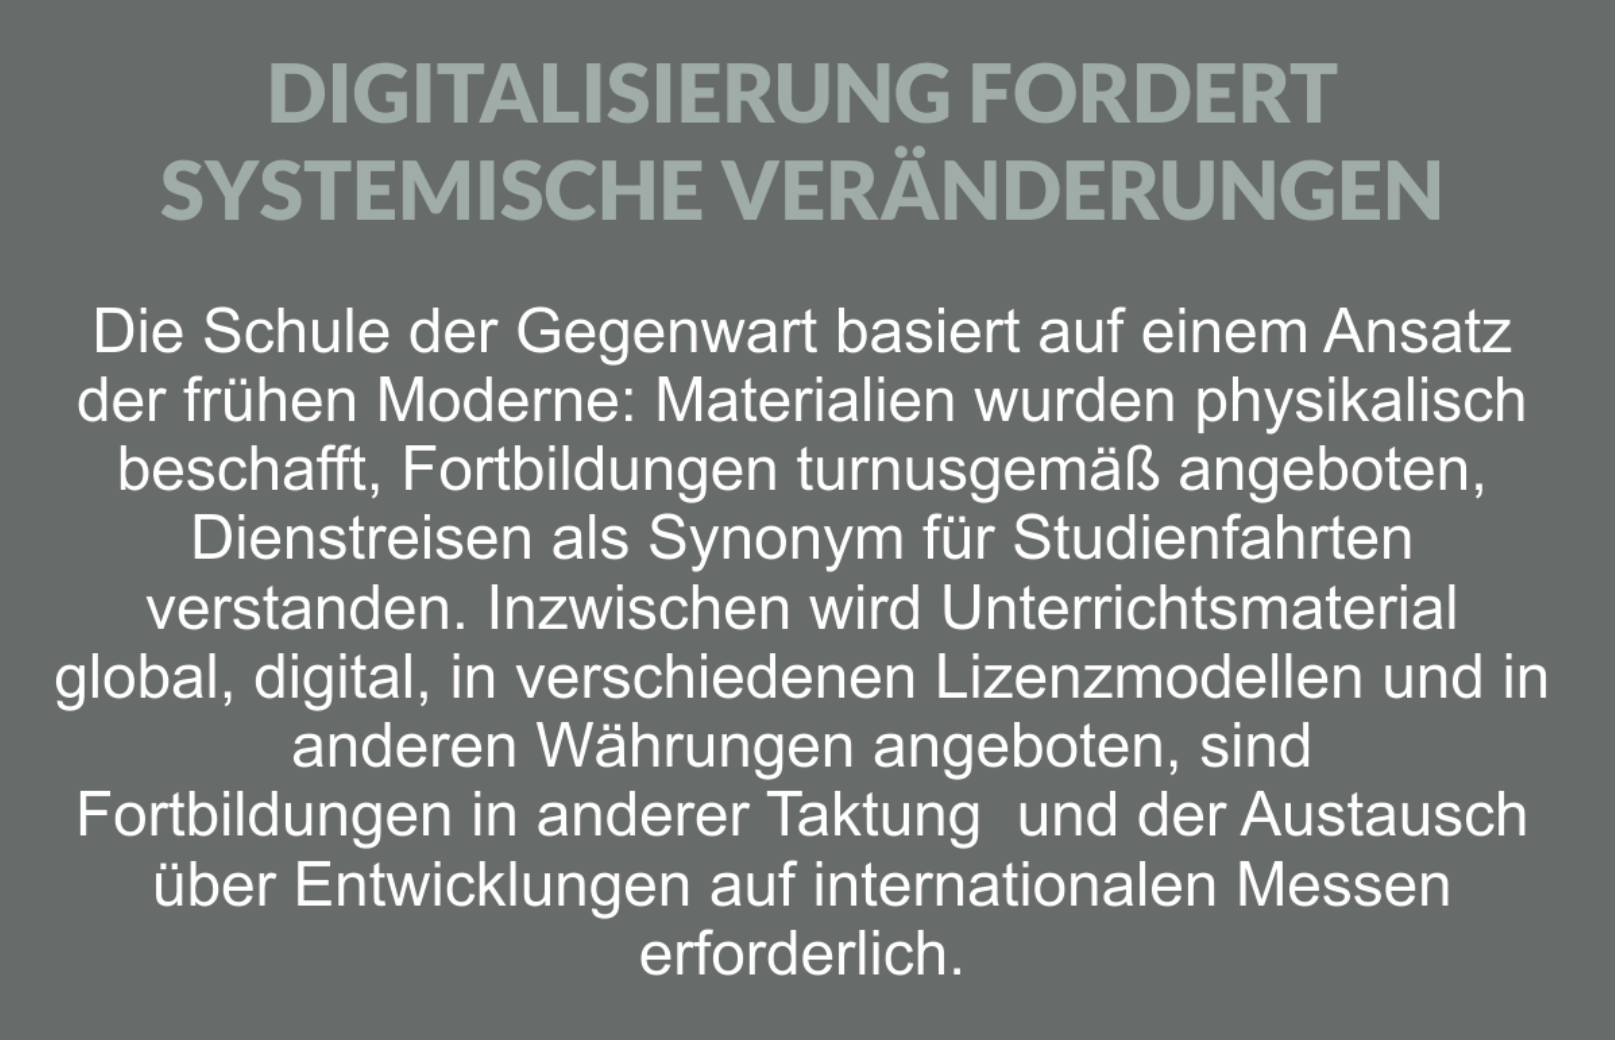 digitalisierung4_cr